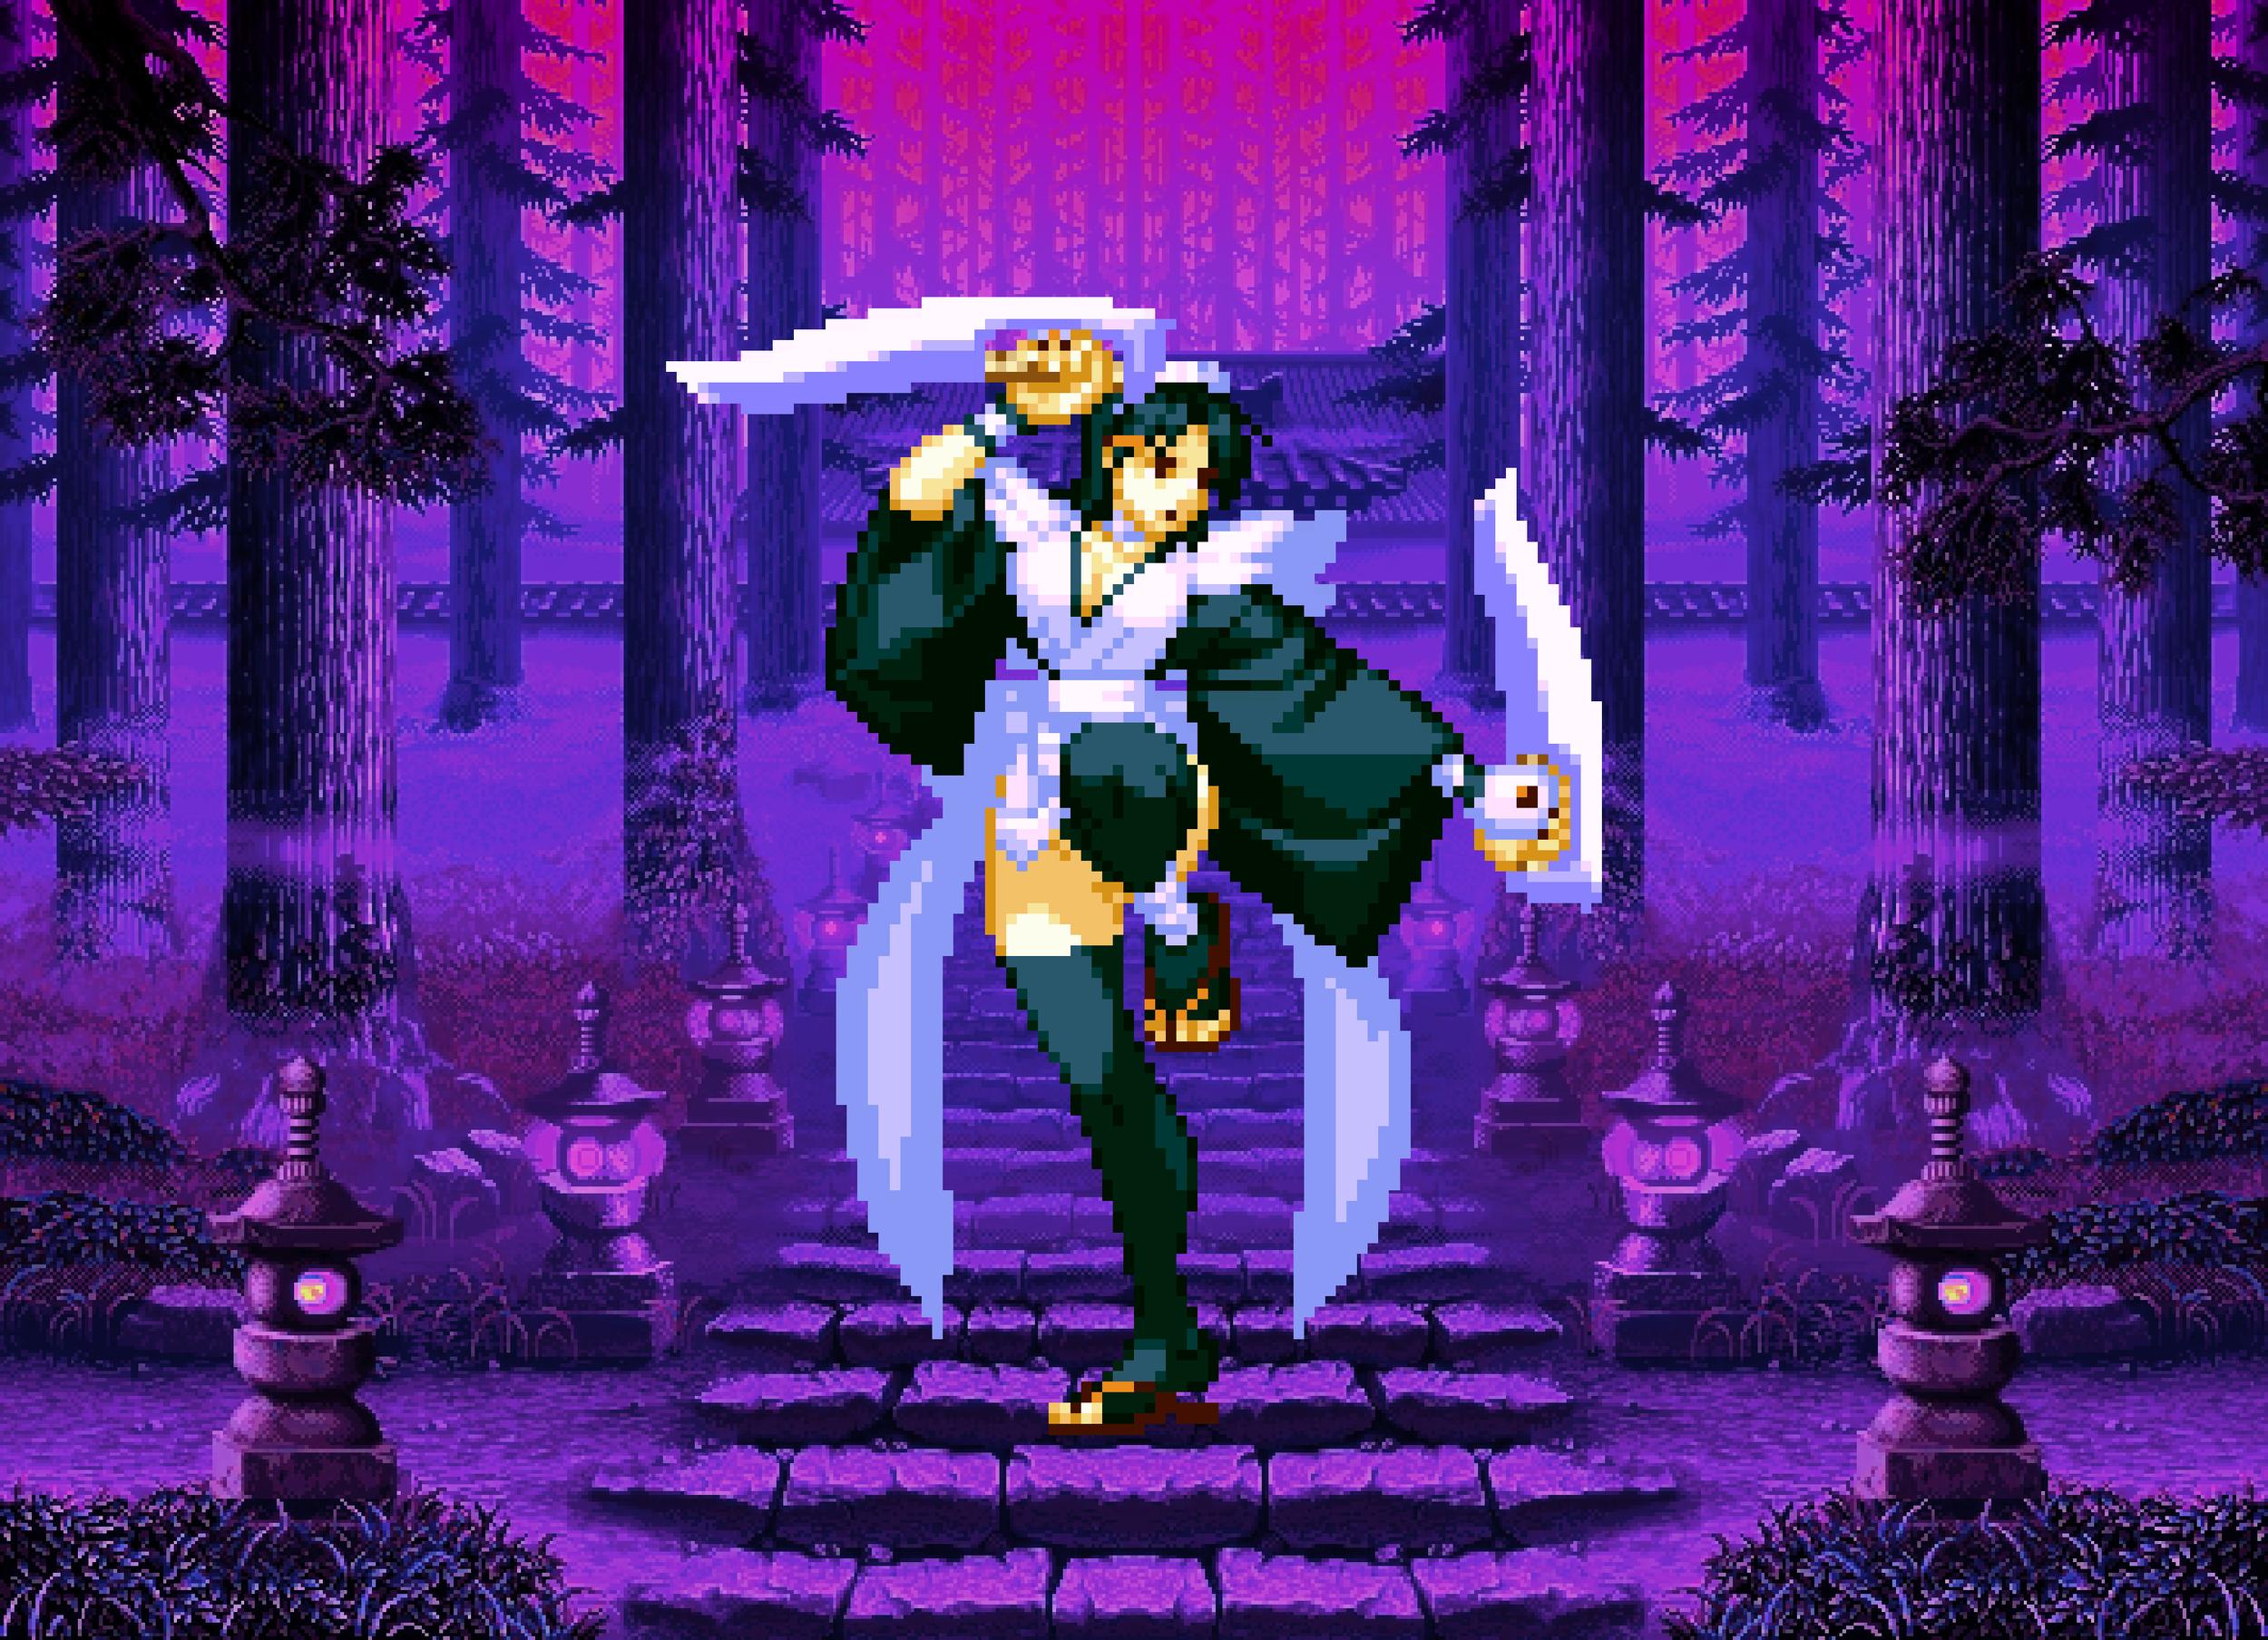 iroha-samirai-shodown-pixelart.png